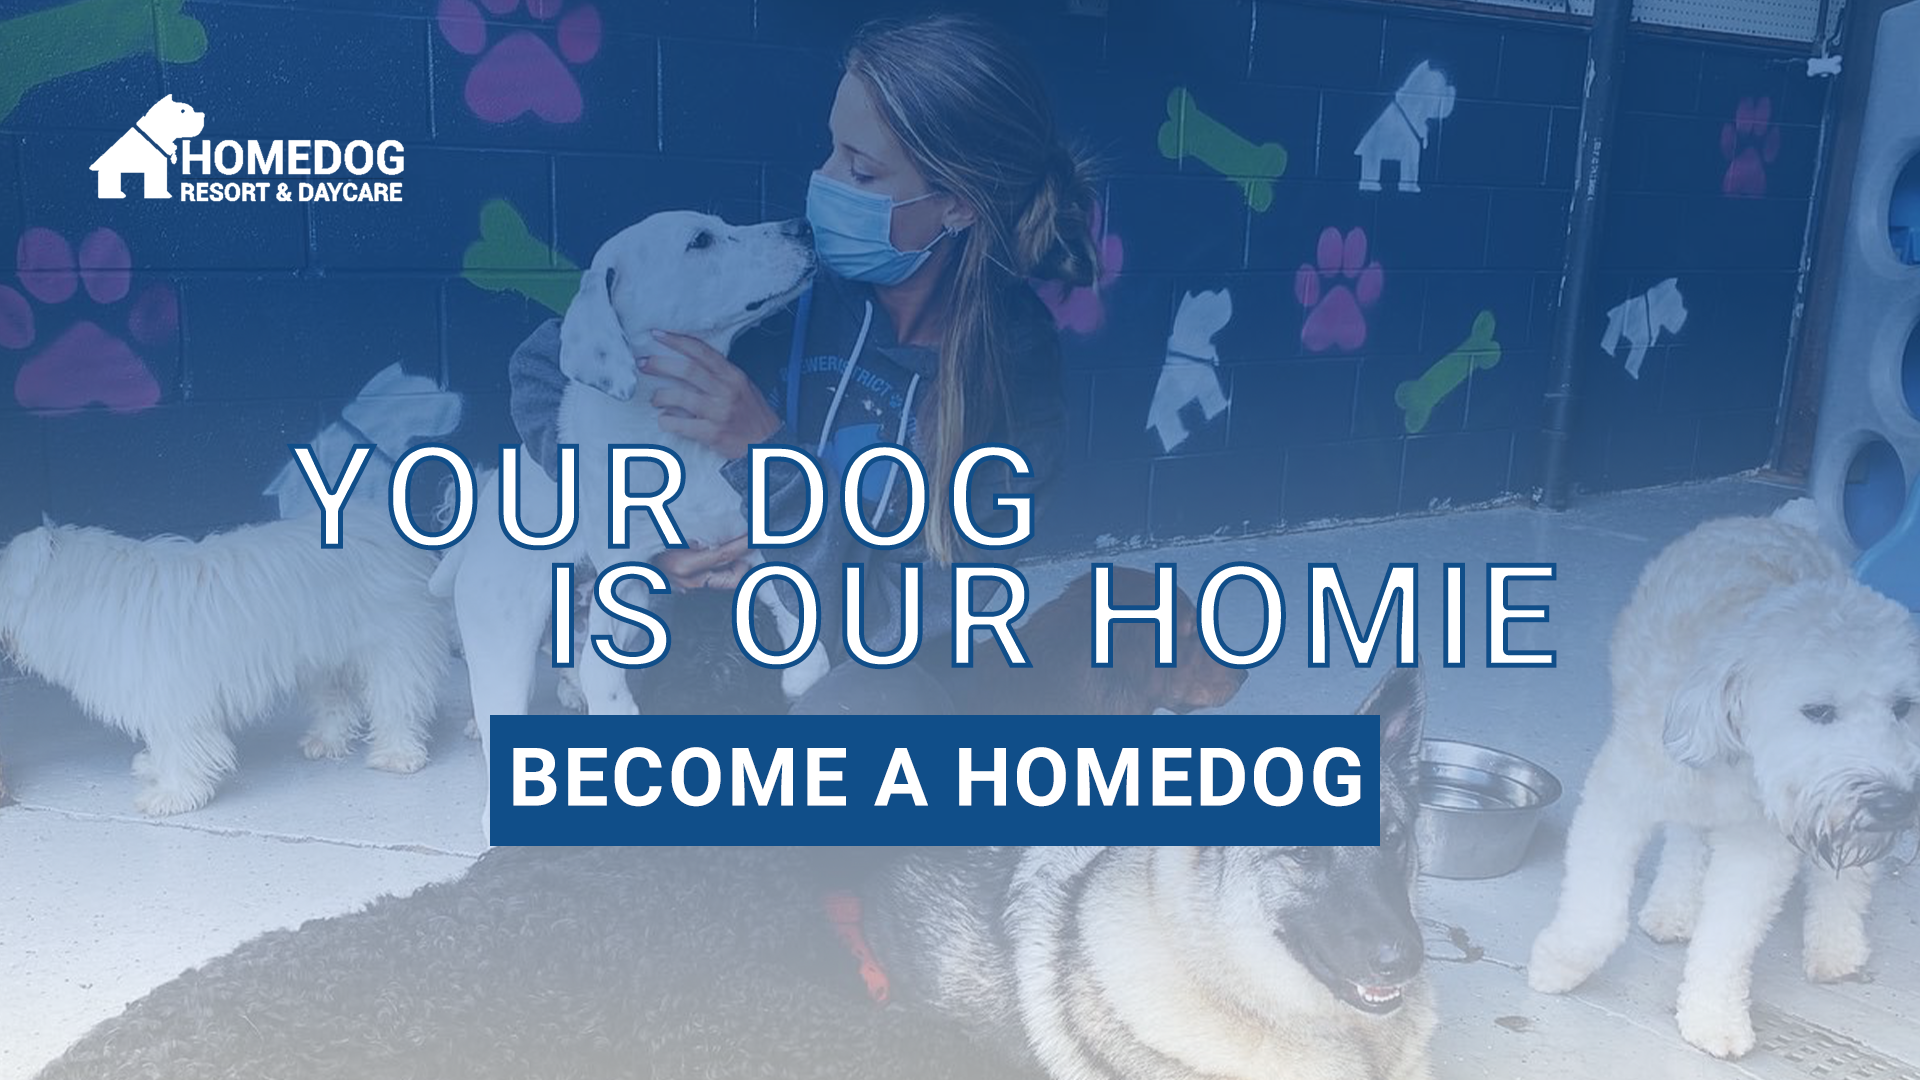 Homedog Resort & Daycare Dog Boarding Dog Daycare and Dog Training Facility